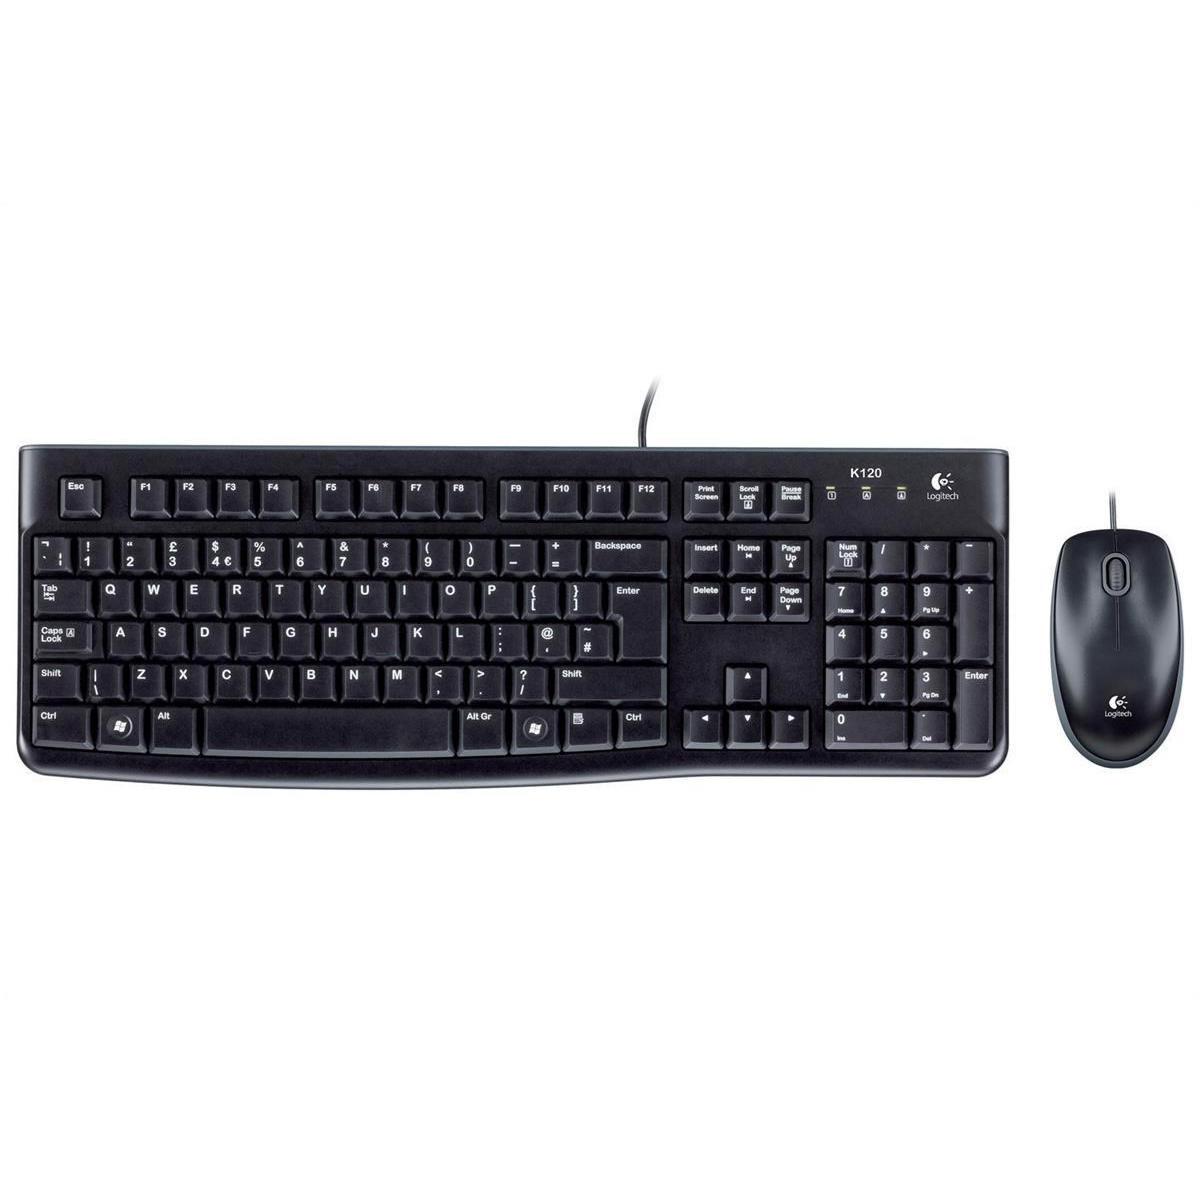 Logitech® Desktop MK120 USB Wired Mouse & Keyboard Combo, English